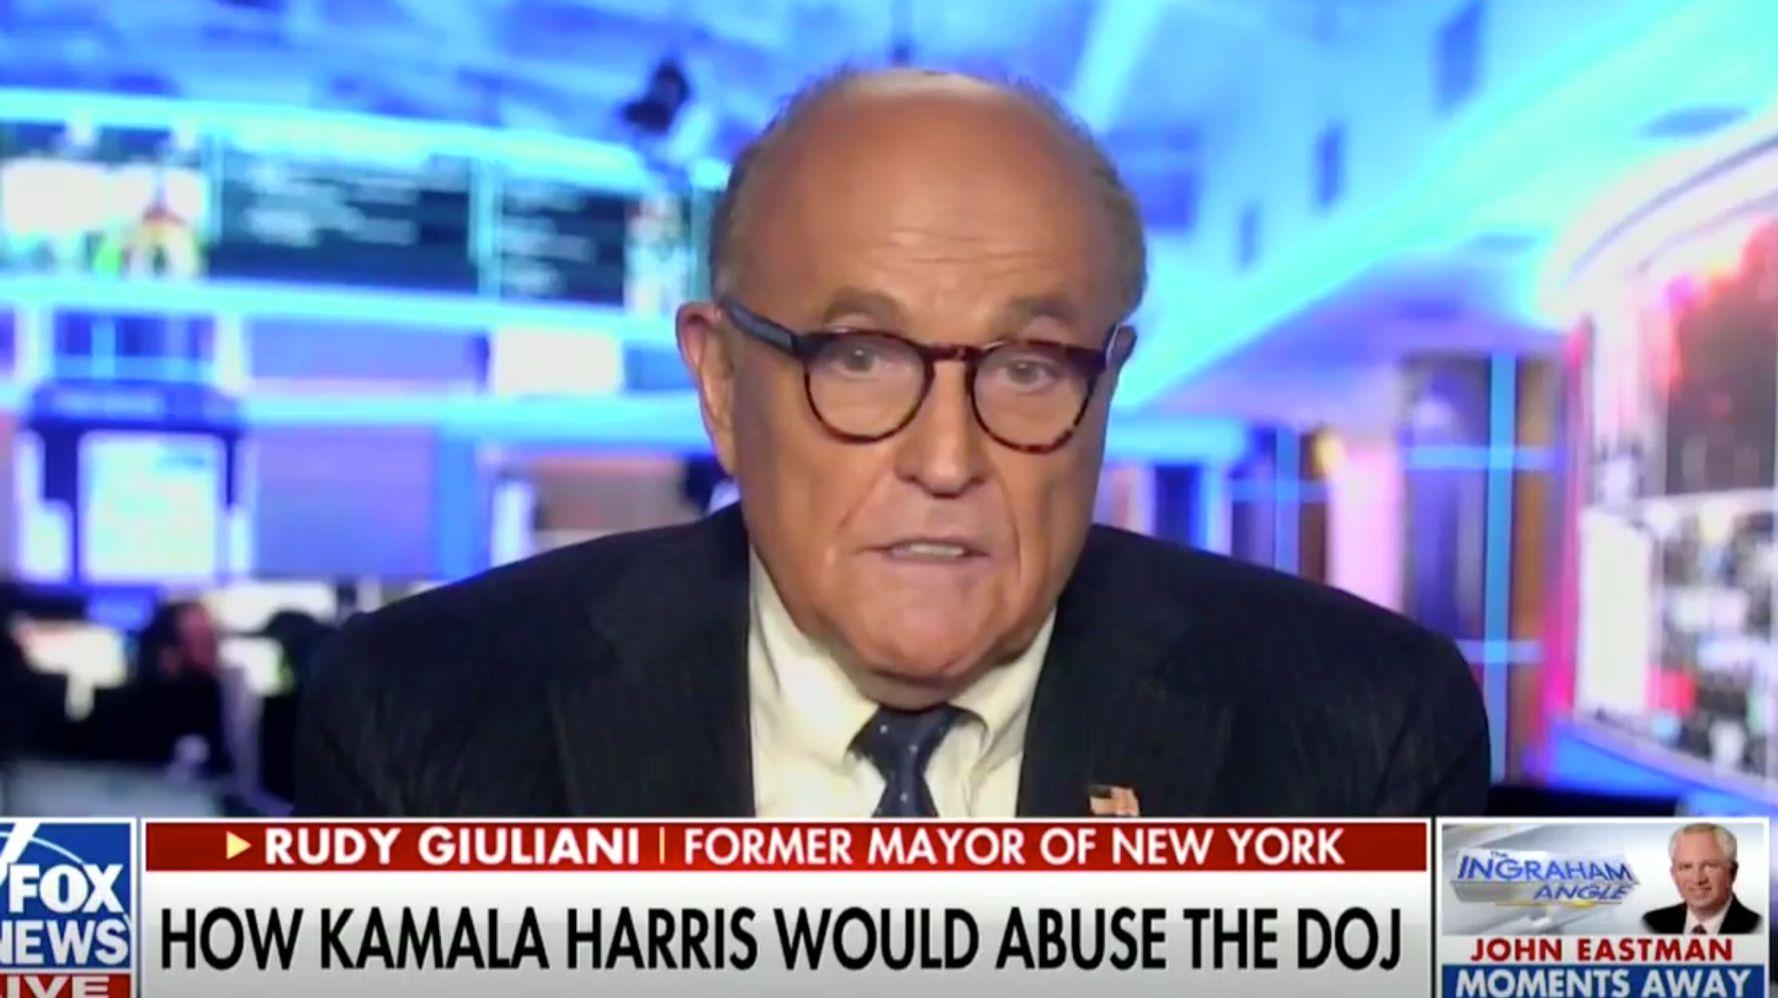 Rudy Giuliani: U.S. Would Become 'Banana Republic' If Biden's DOJ Prosecuted Trump